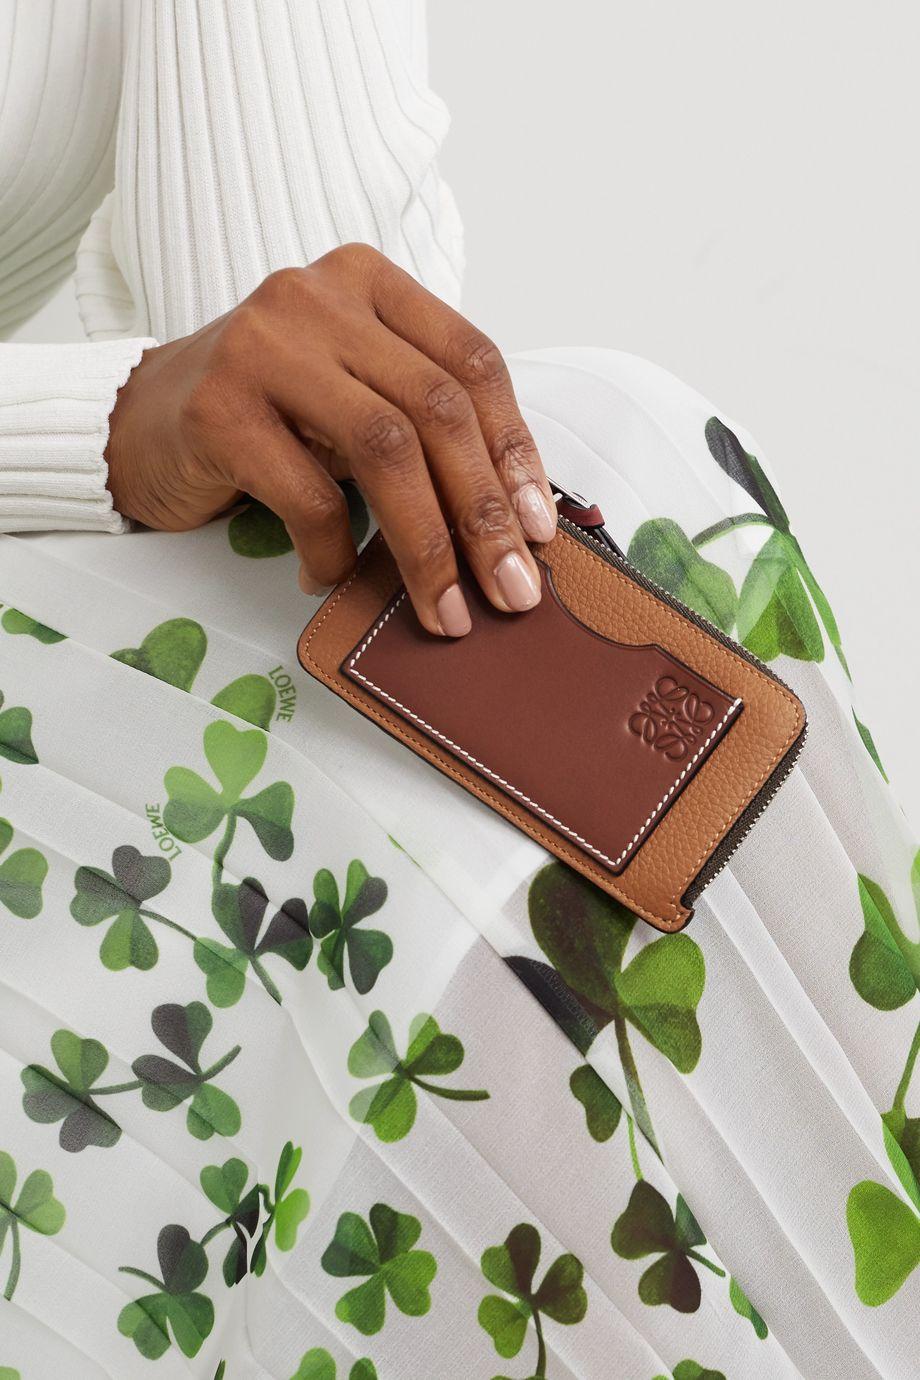 Loewe Porte-cartes en cuir texturé